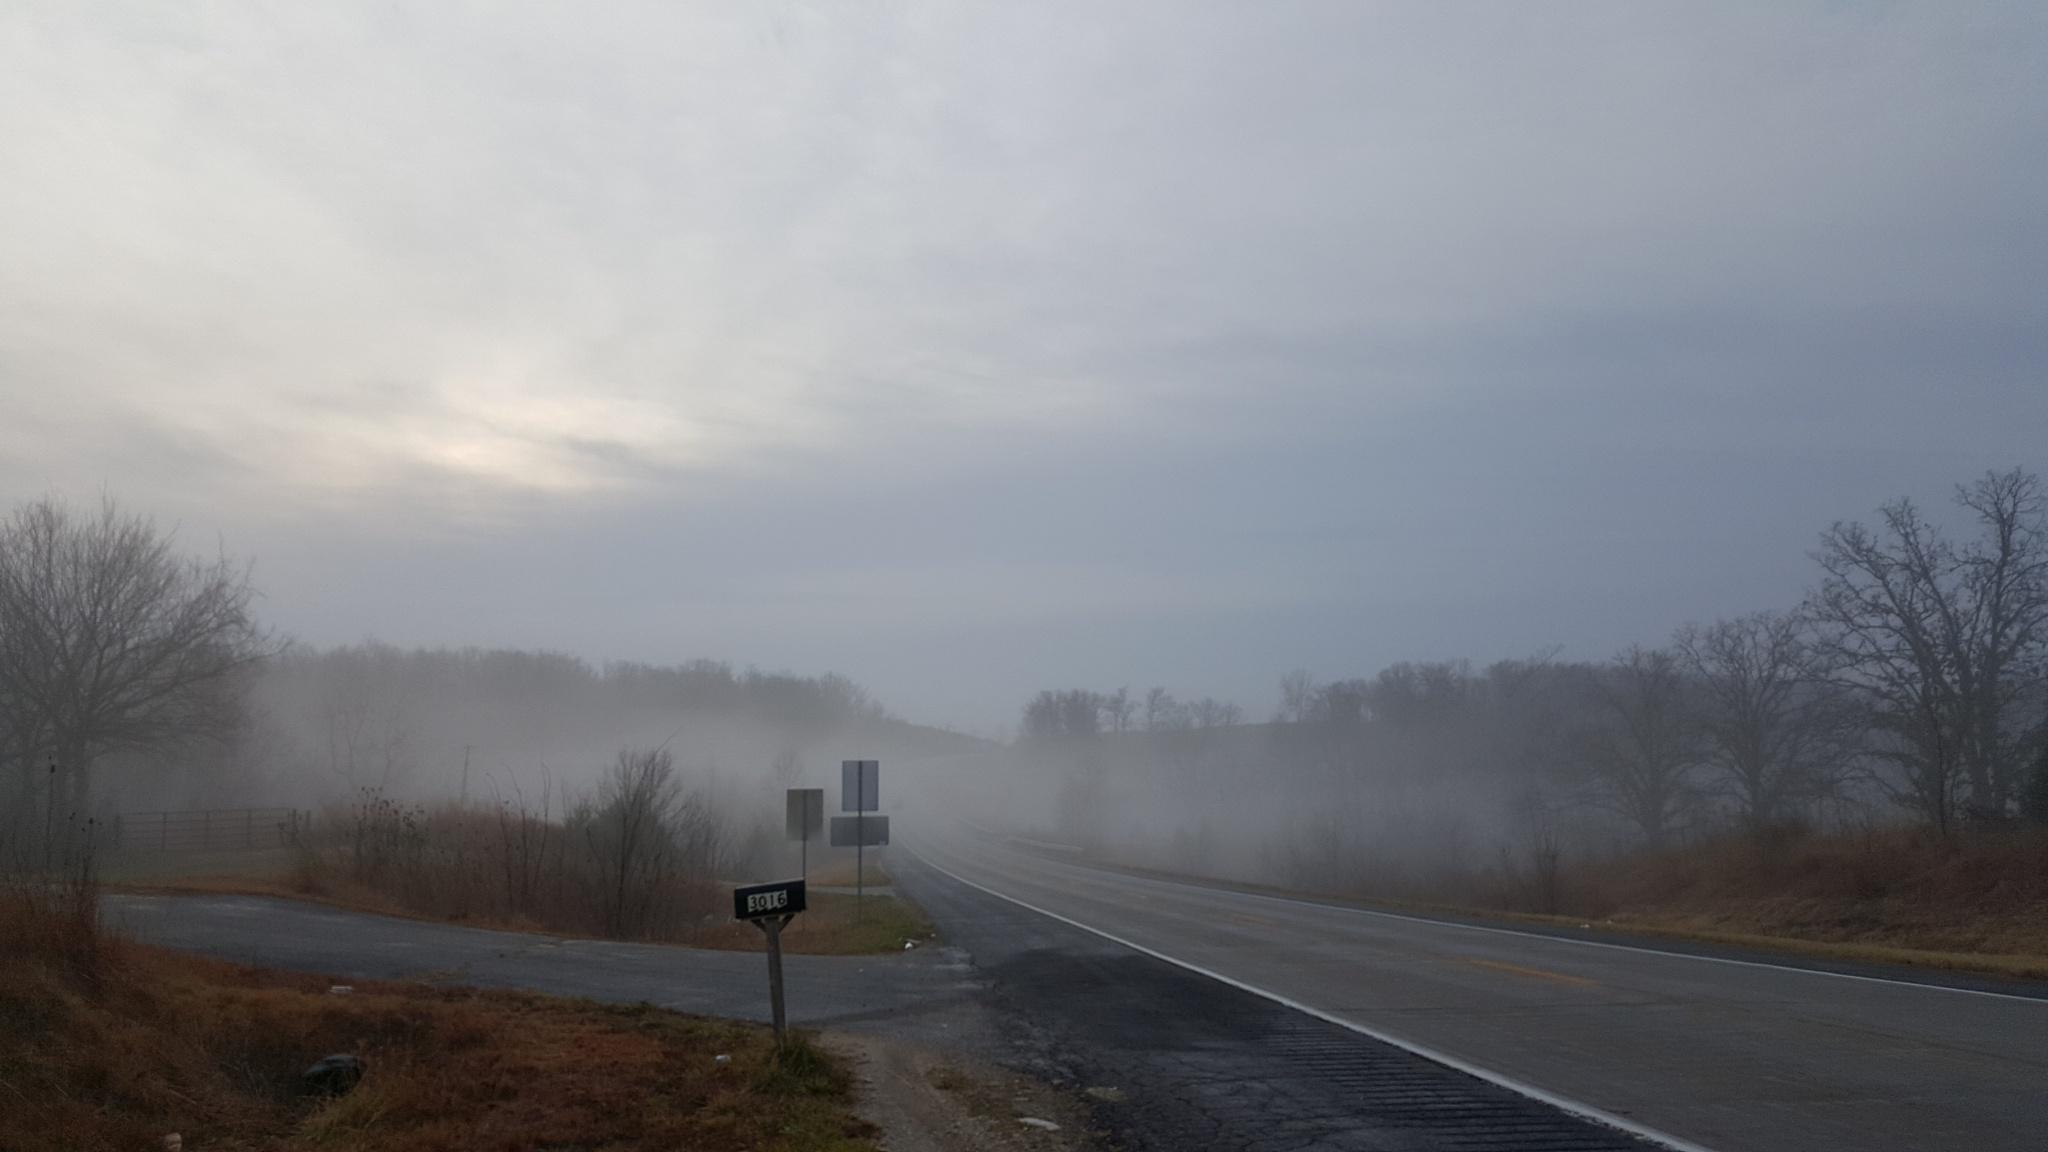 foggy valley by Steve Umbaugh